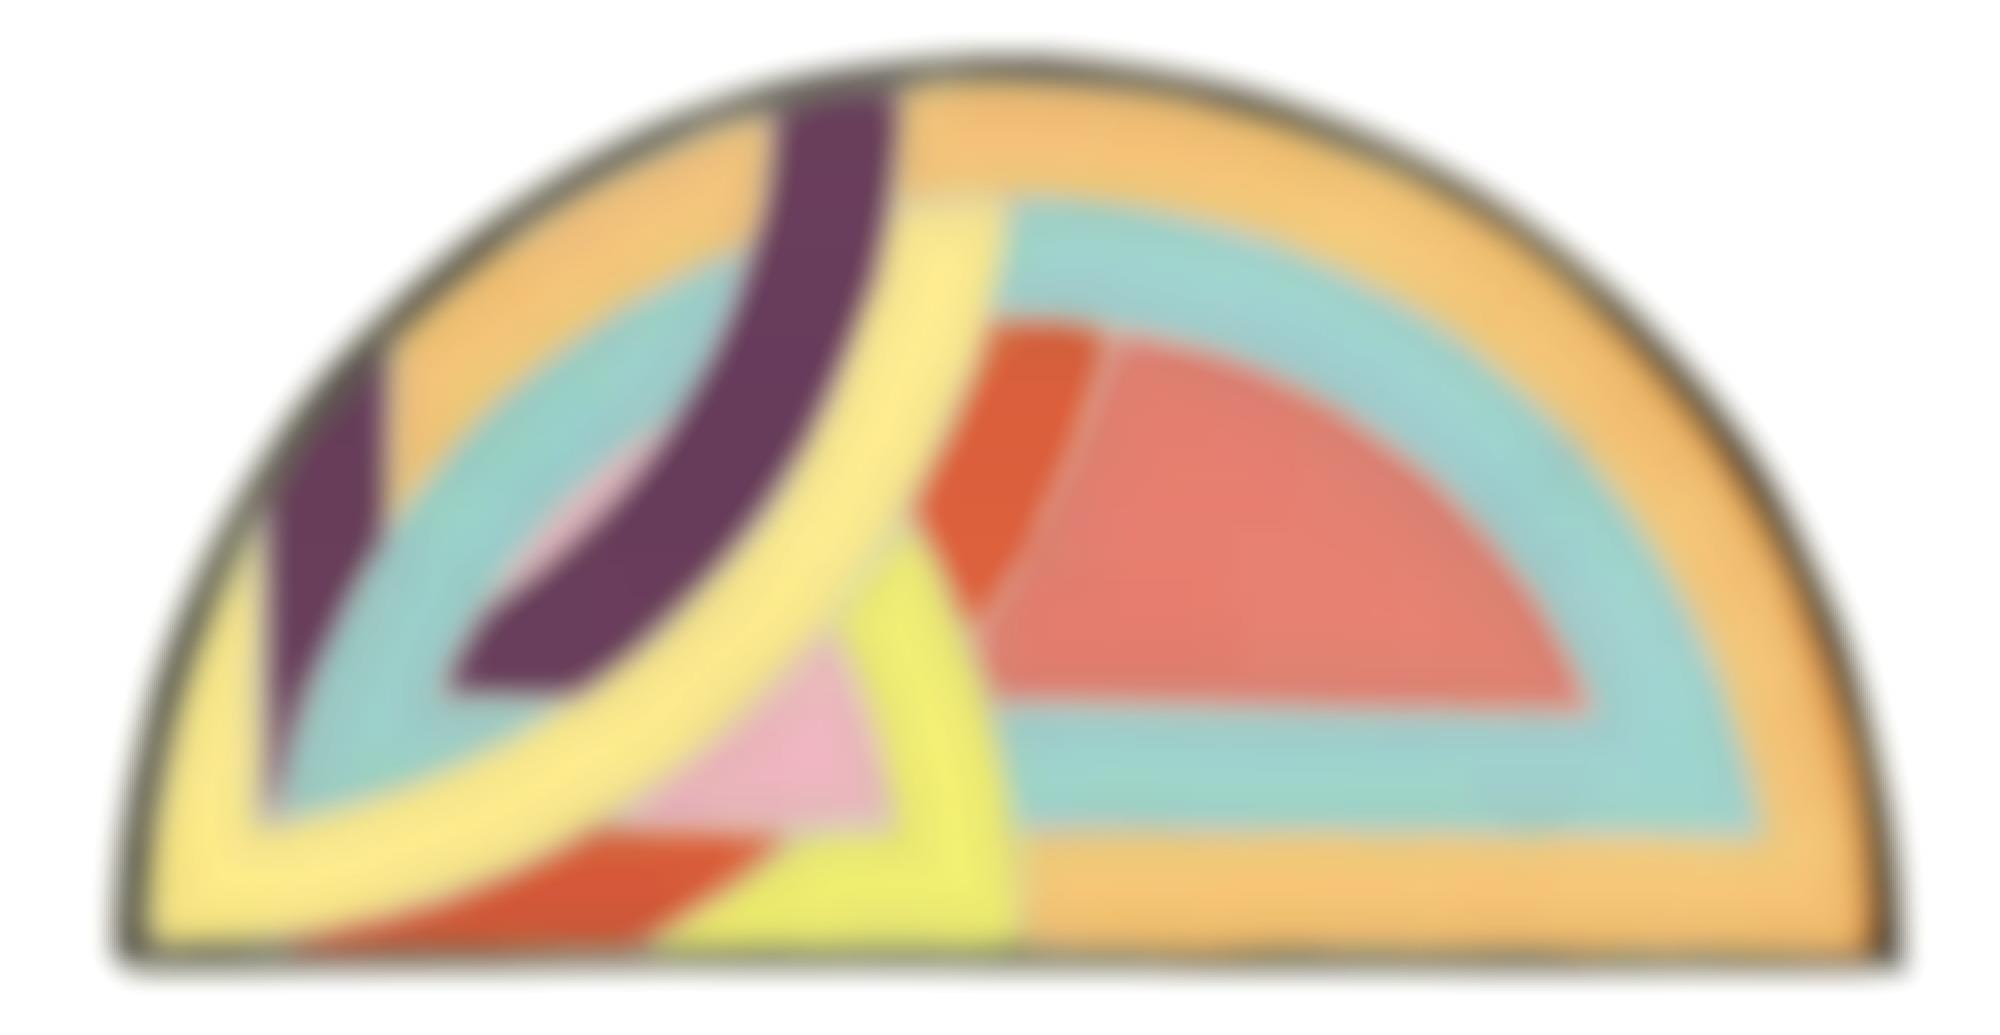 Richard Pettibone-Frank Stella, Protractor Variation IV, 1968-1969